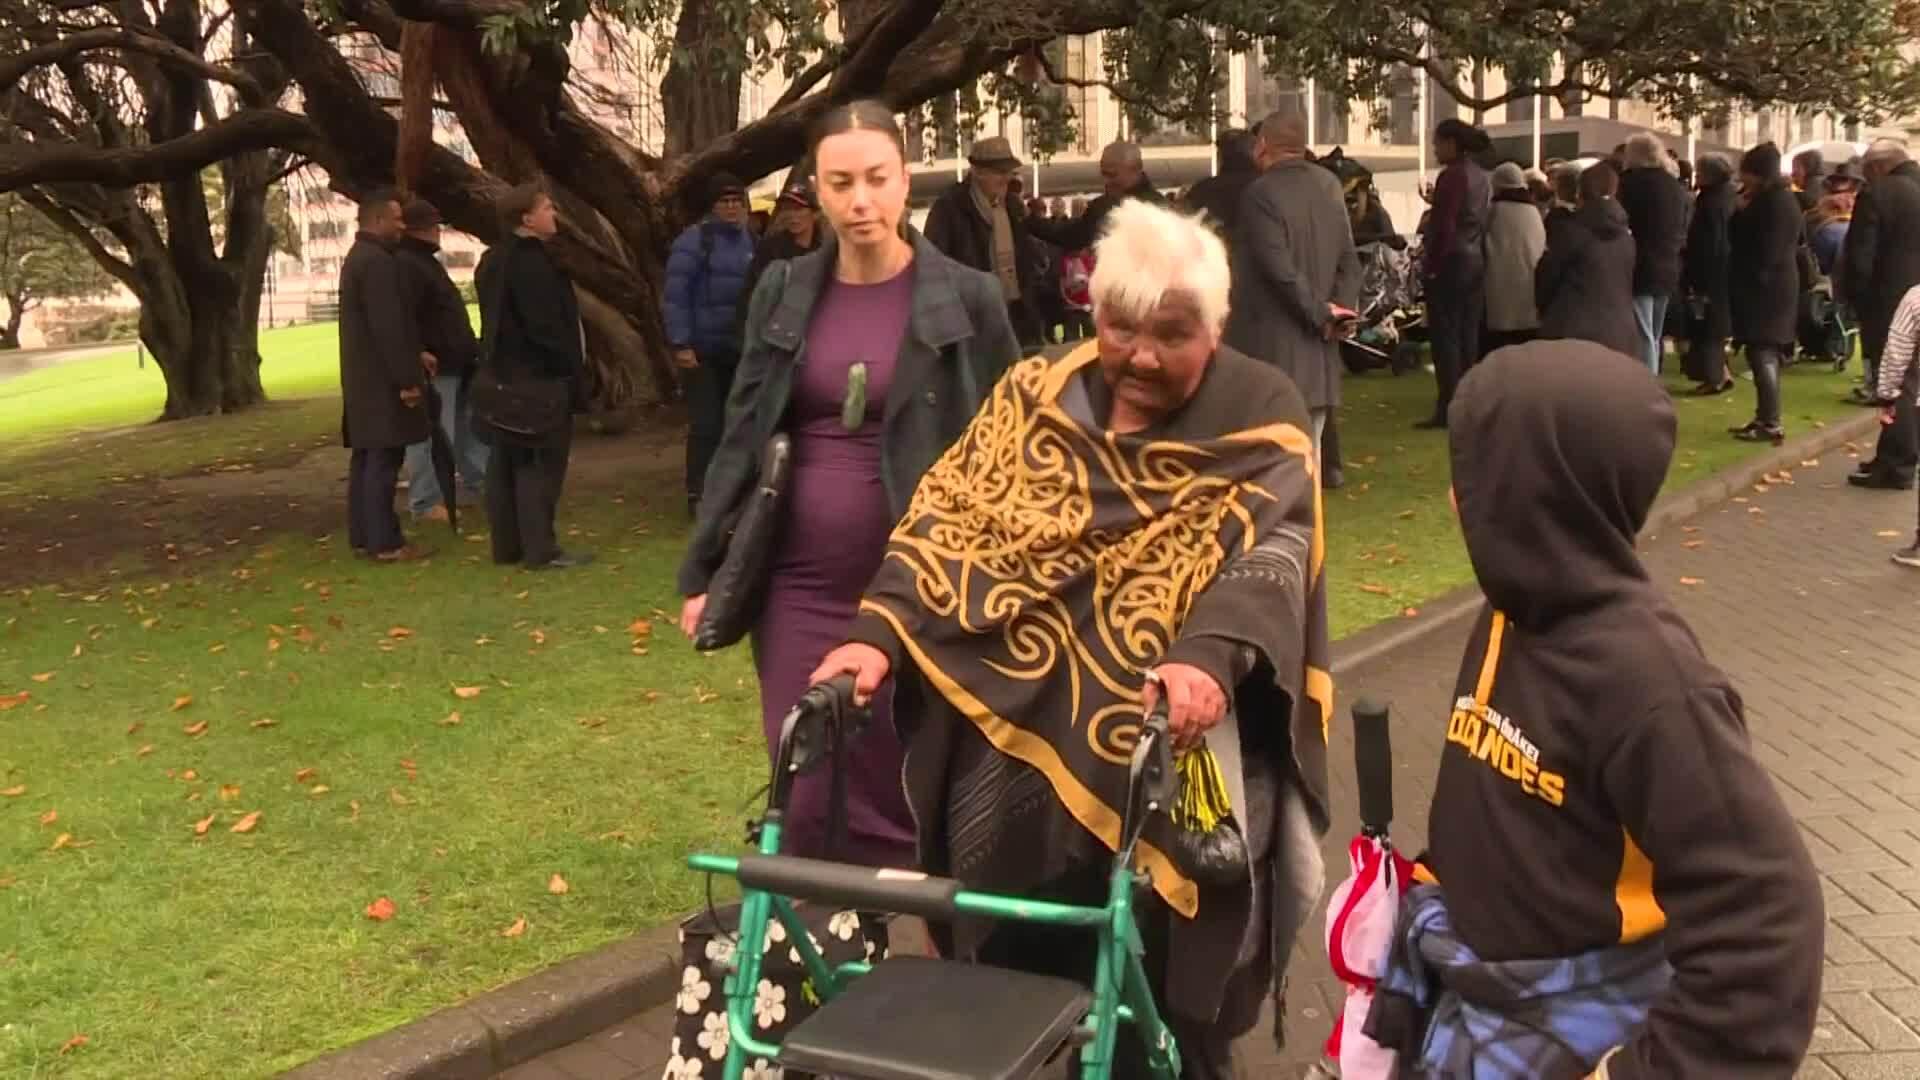 Video for Ngāti Whātua Ōrākei address tikanga issue in court